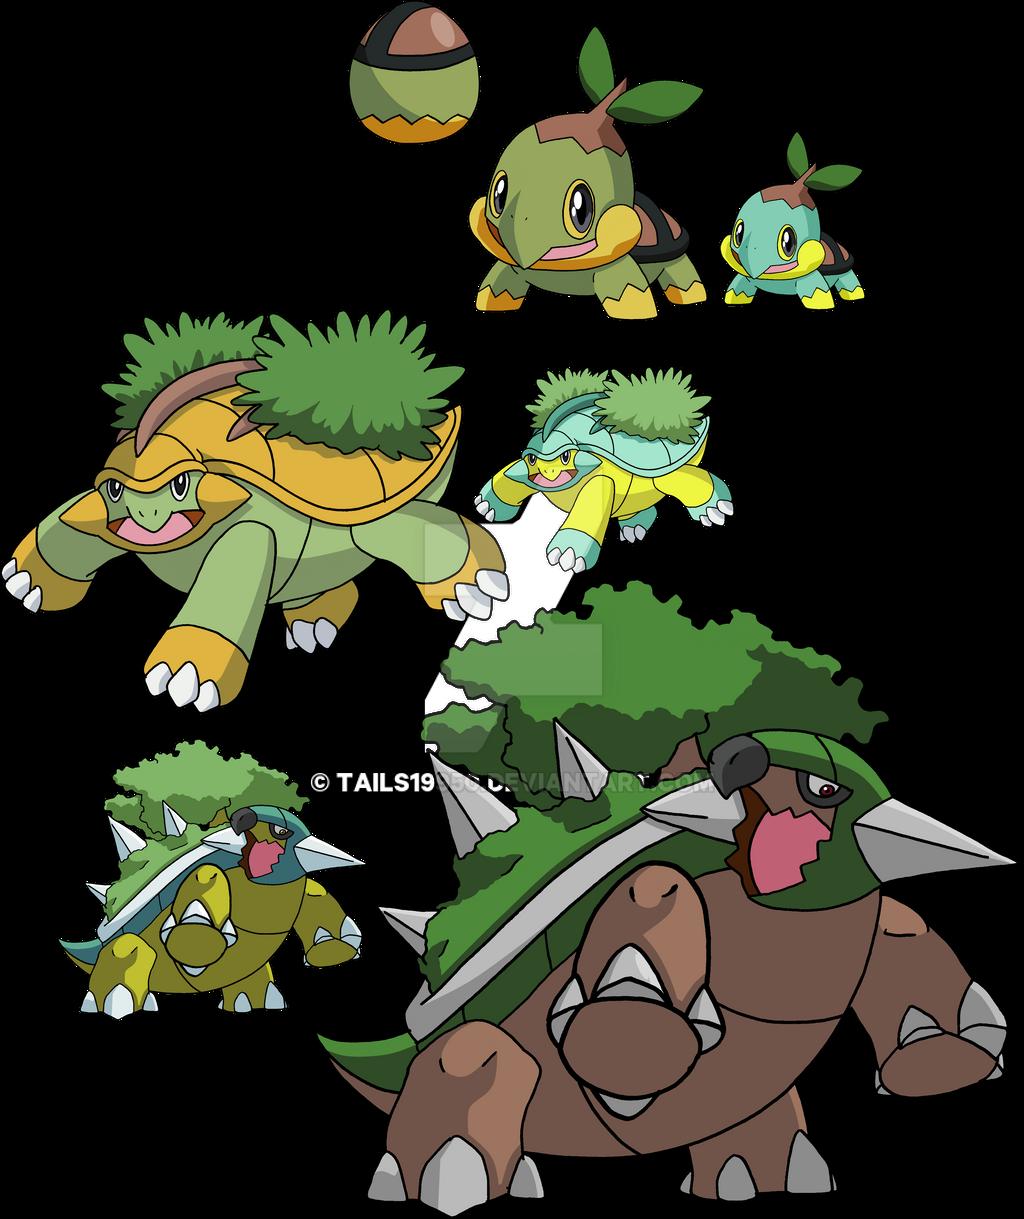 Turtwig-Grotle-Torterra favourites by MCsaurus on DeviantArt